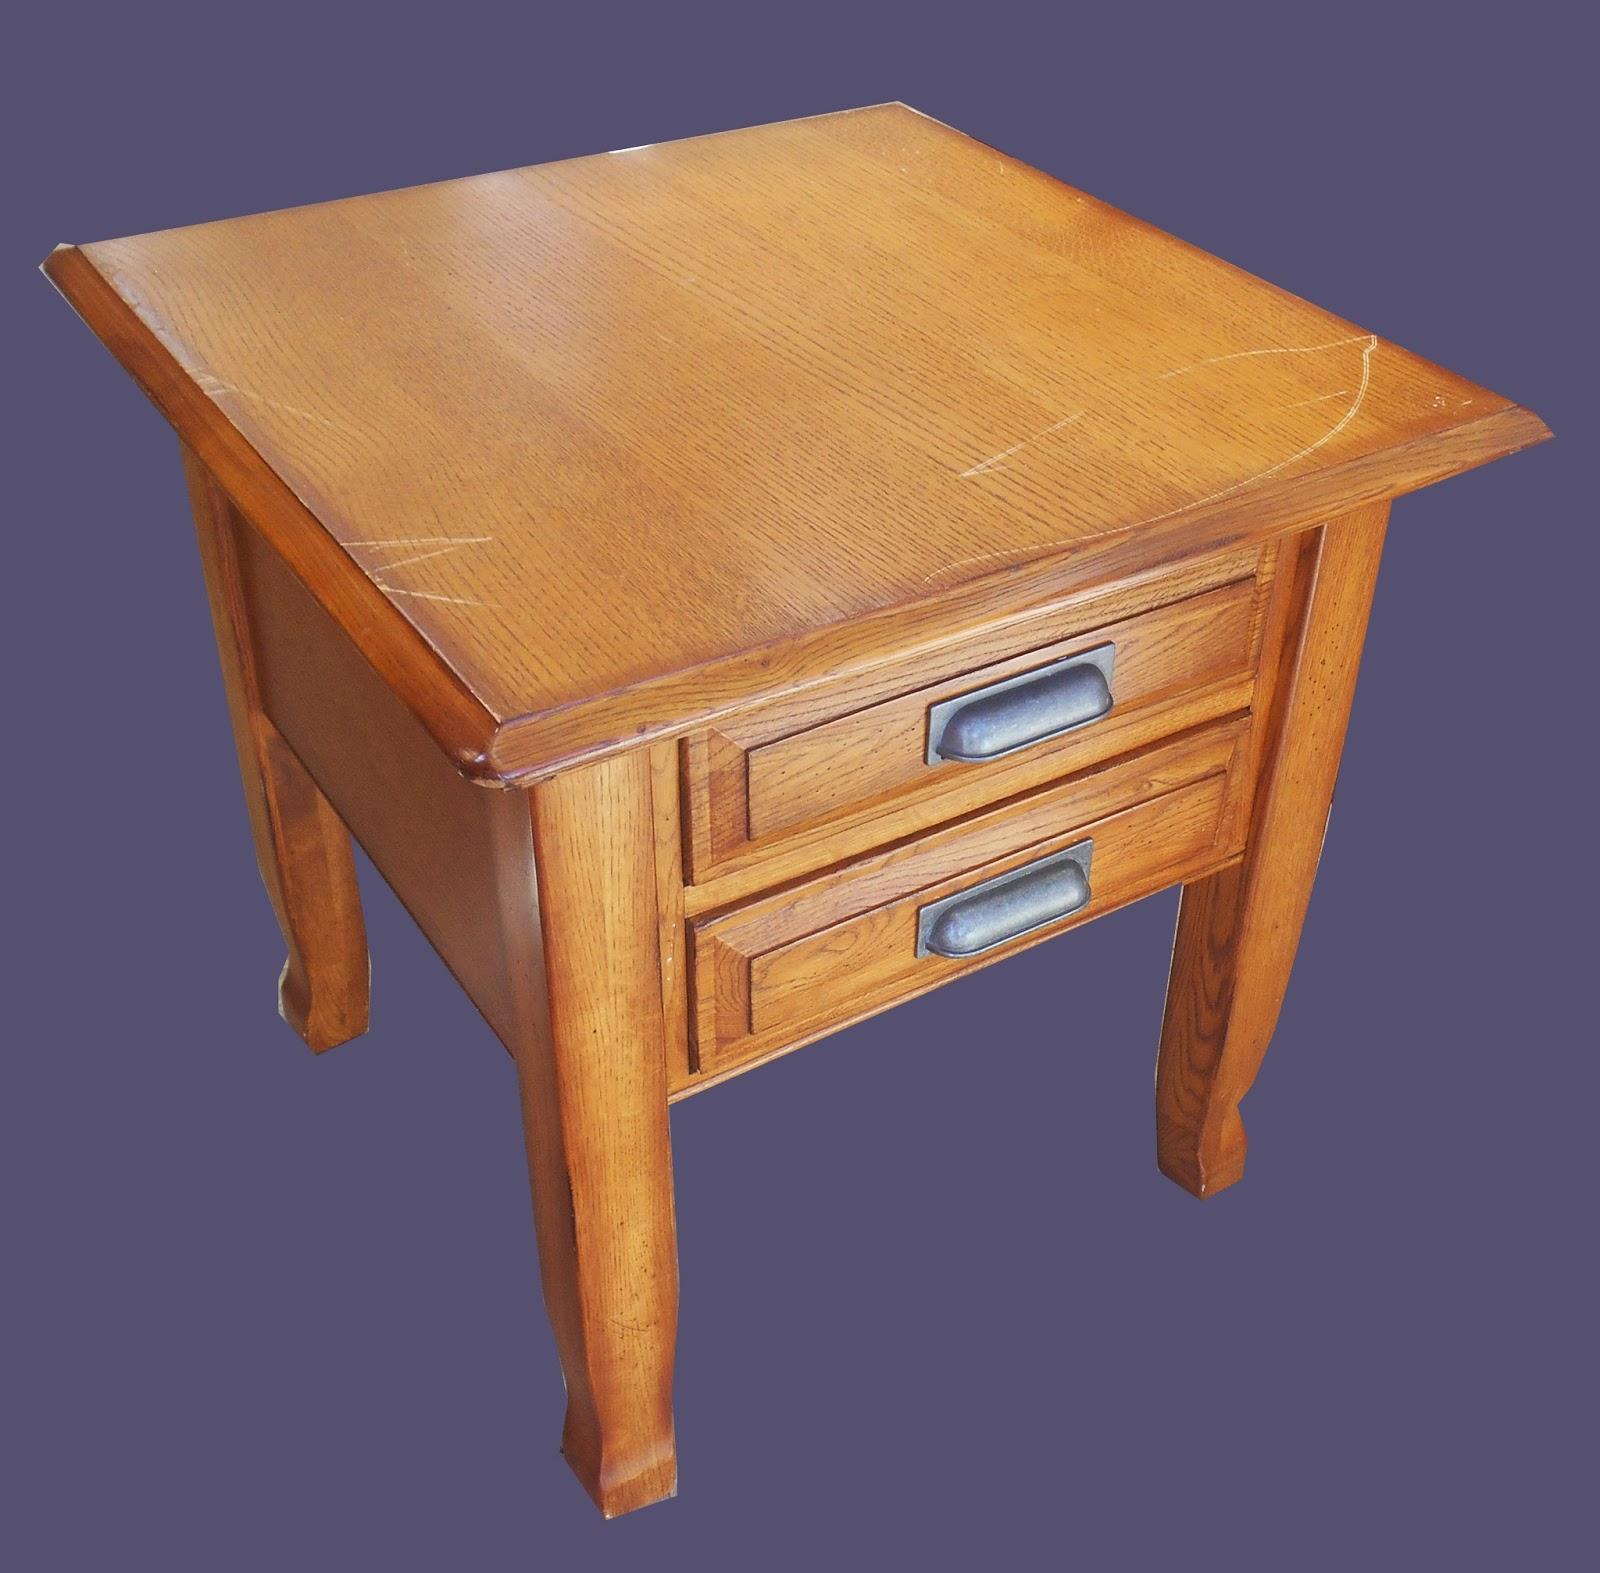 Bergen Junkluggers: Bergen NJ Junk Removal and Furniture Pick Up for ...